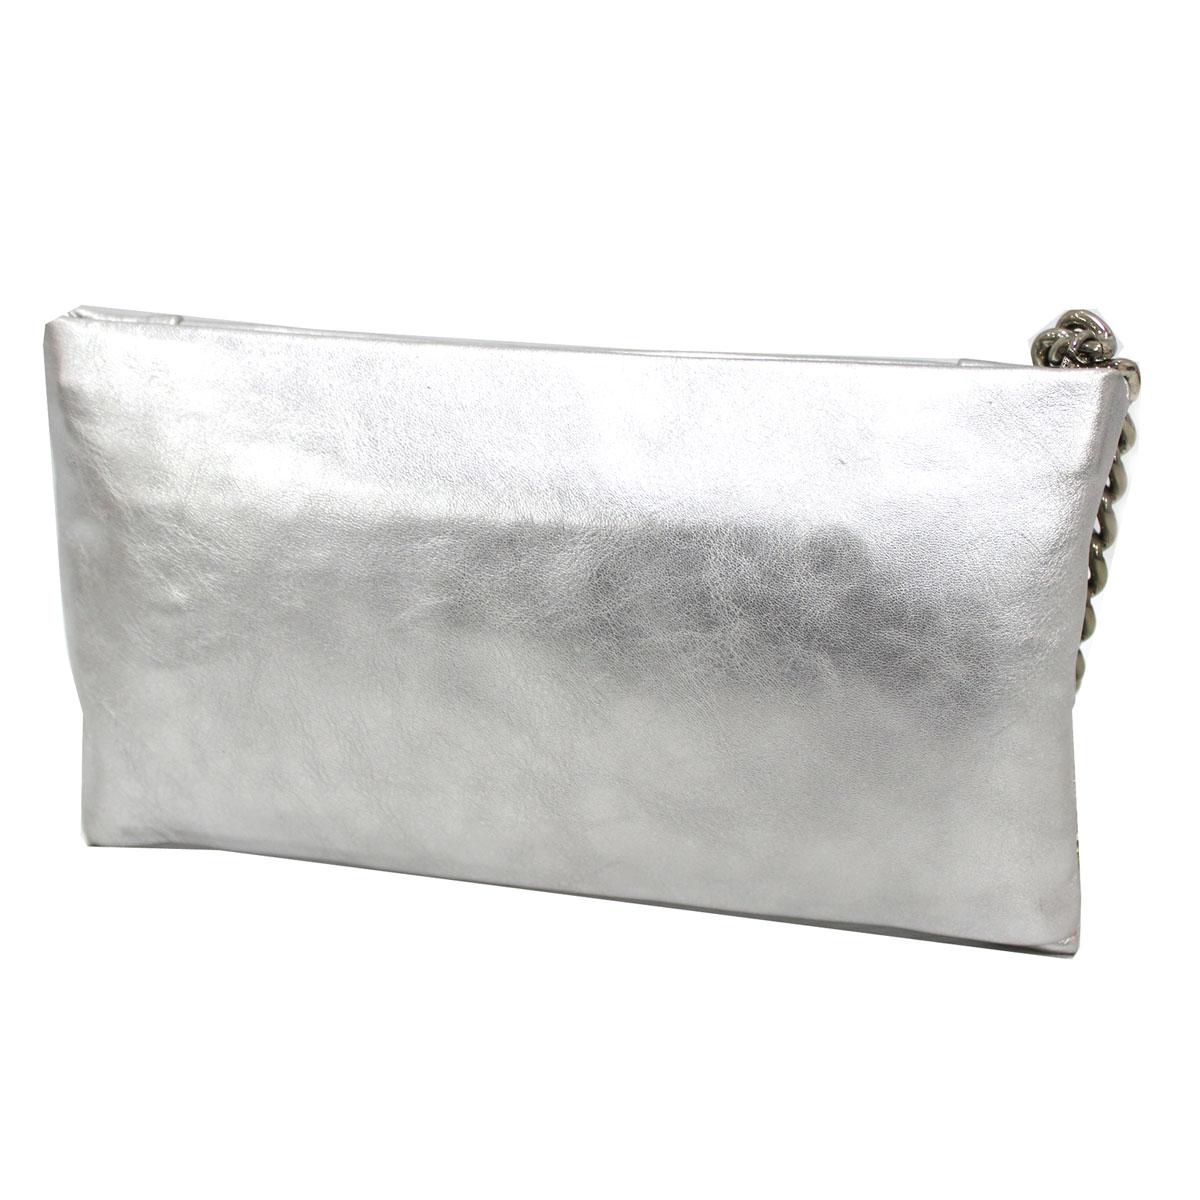 e5df20d7d5 €32,56. Borsetta donna borsa clutch a mano da sera cerimonia pelle Annaluna  191 argento